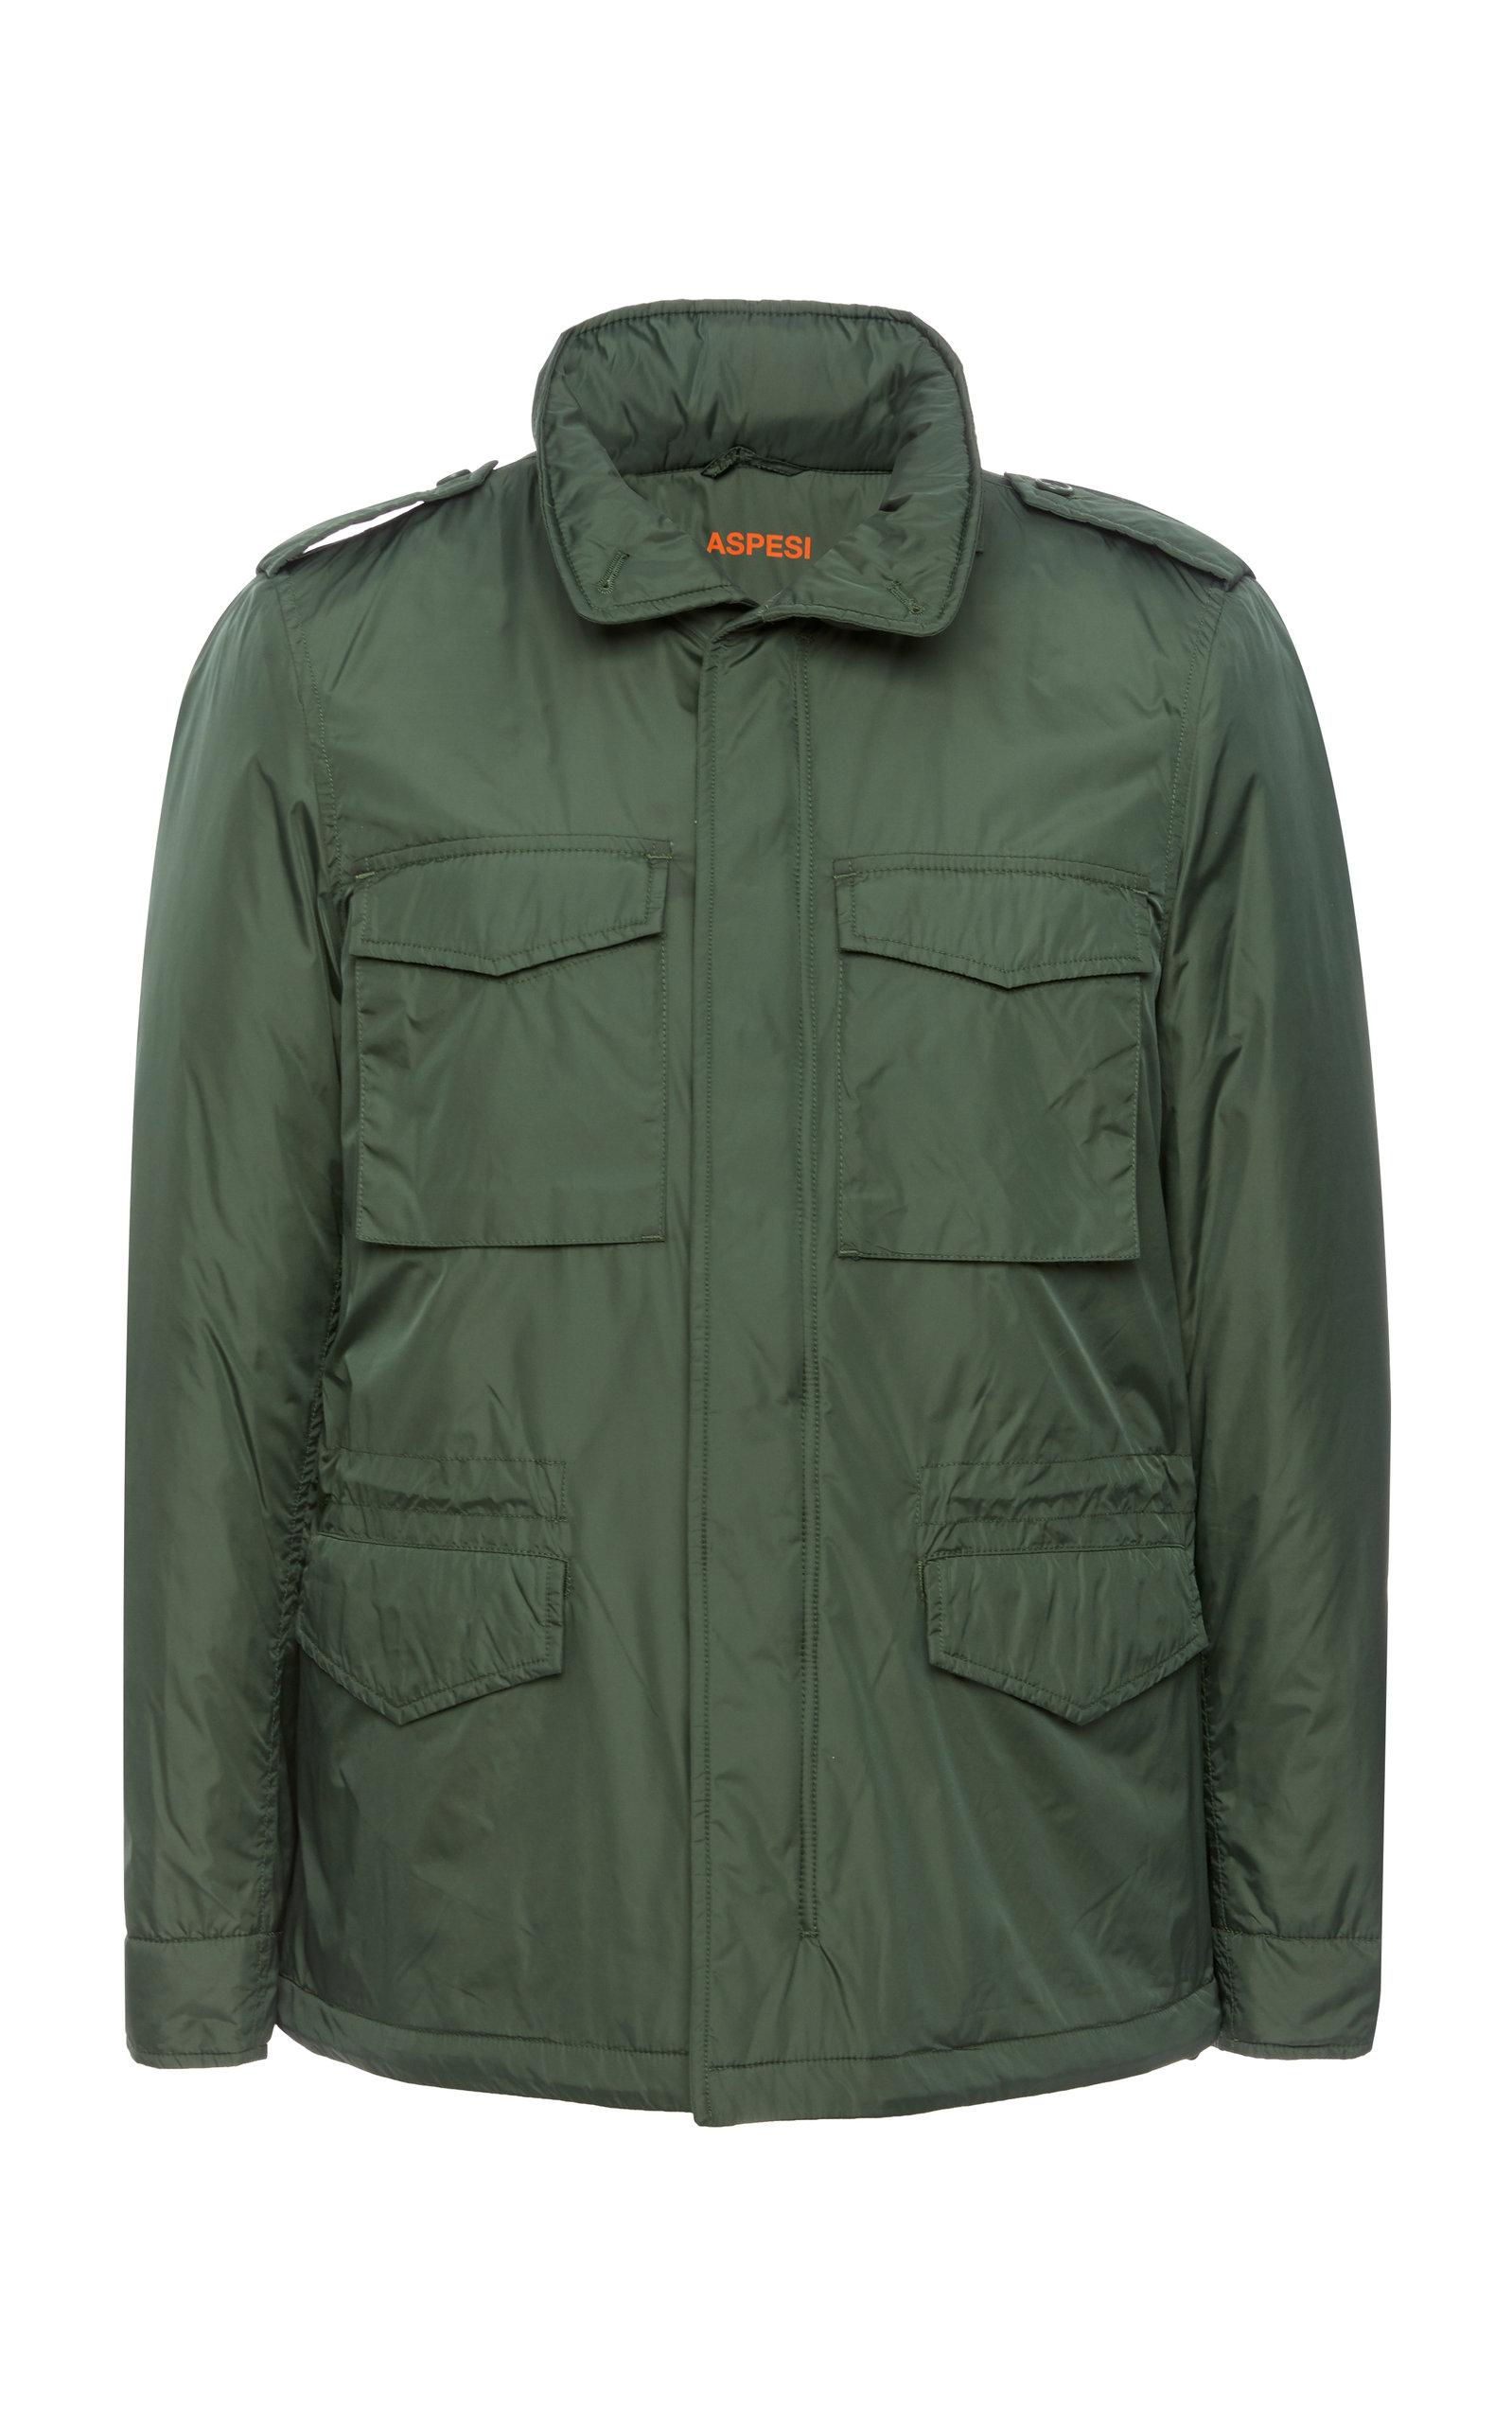 ASPESI Military-Style Jacket in Green